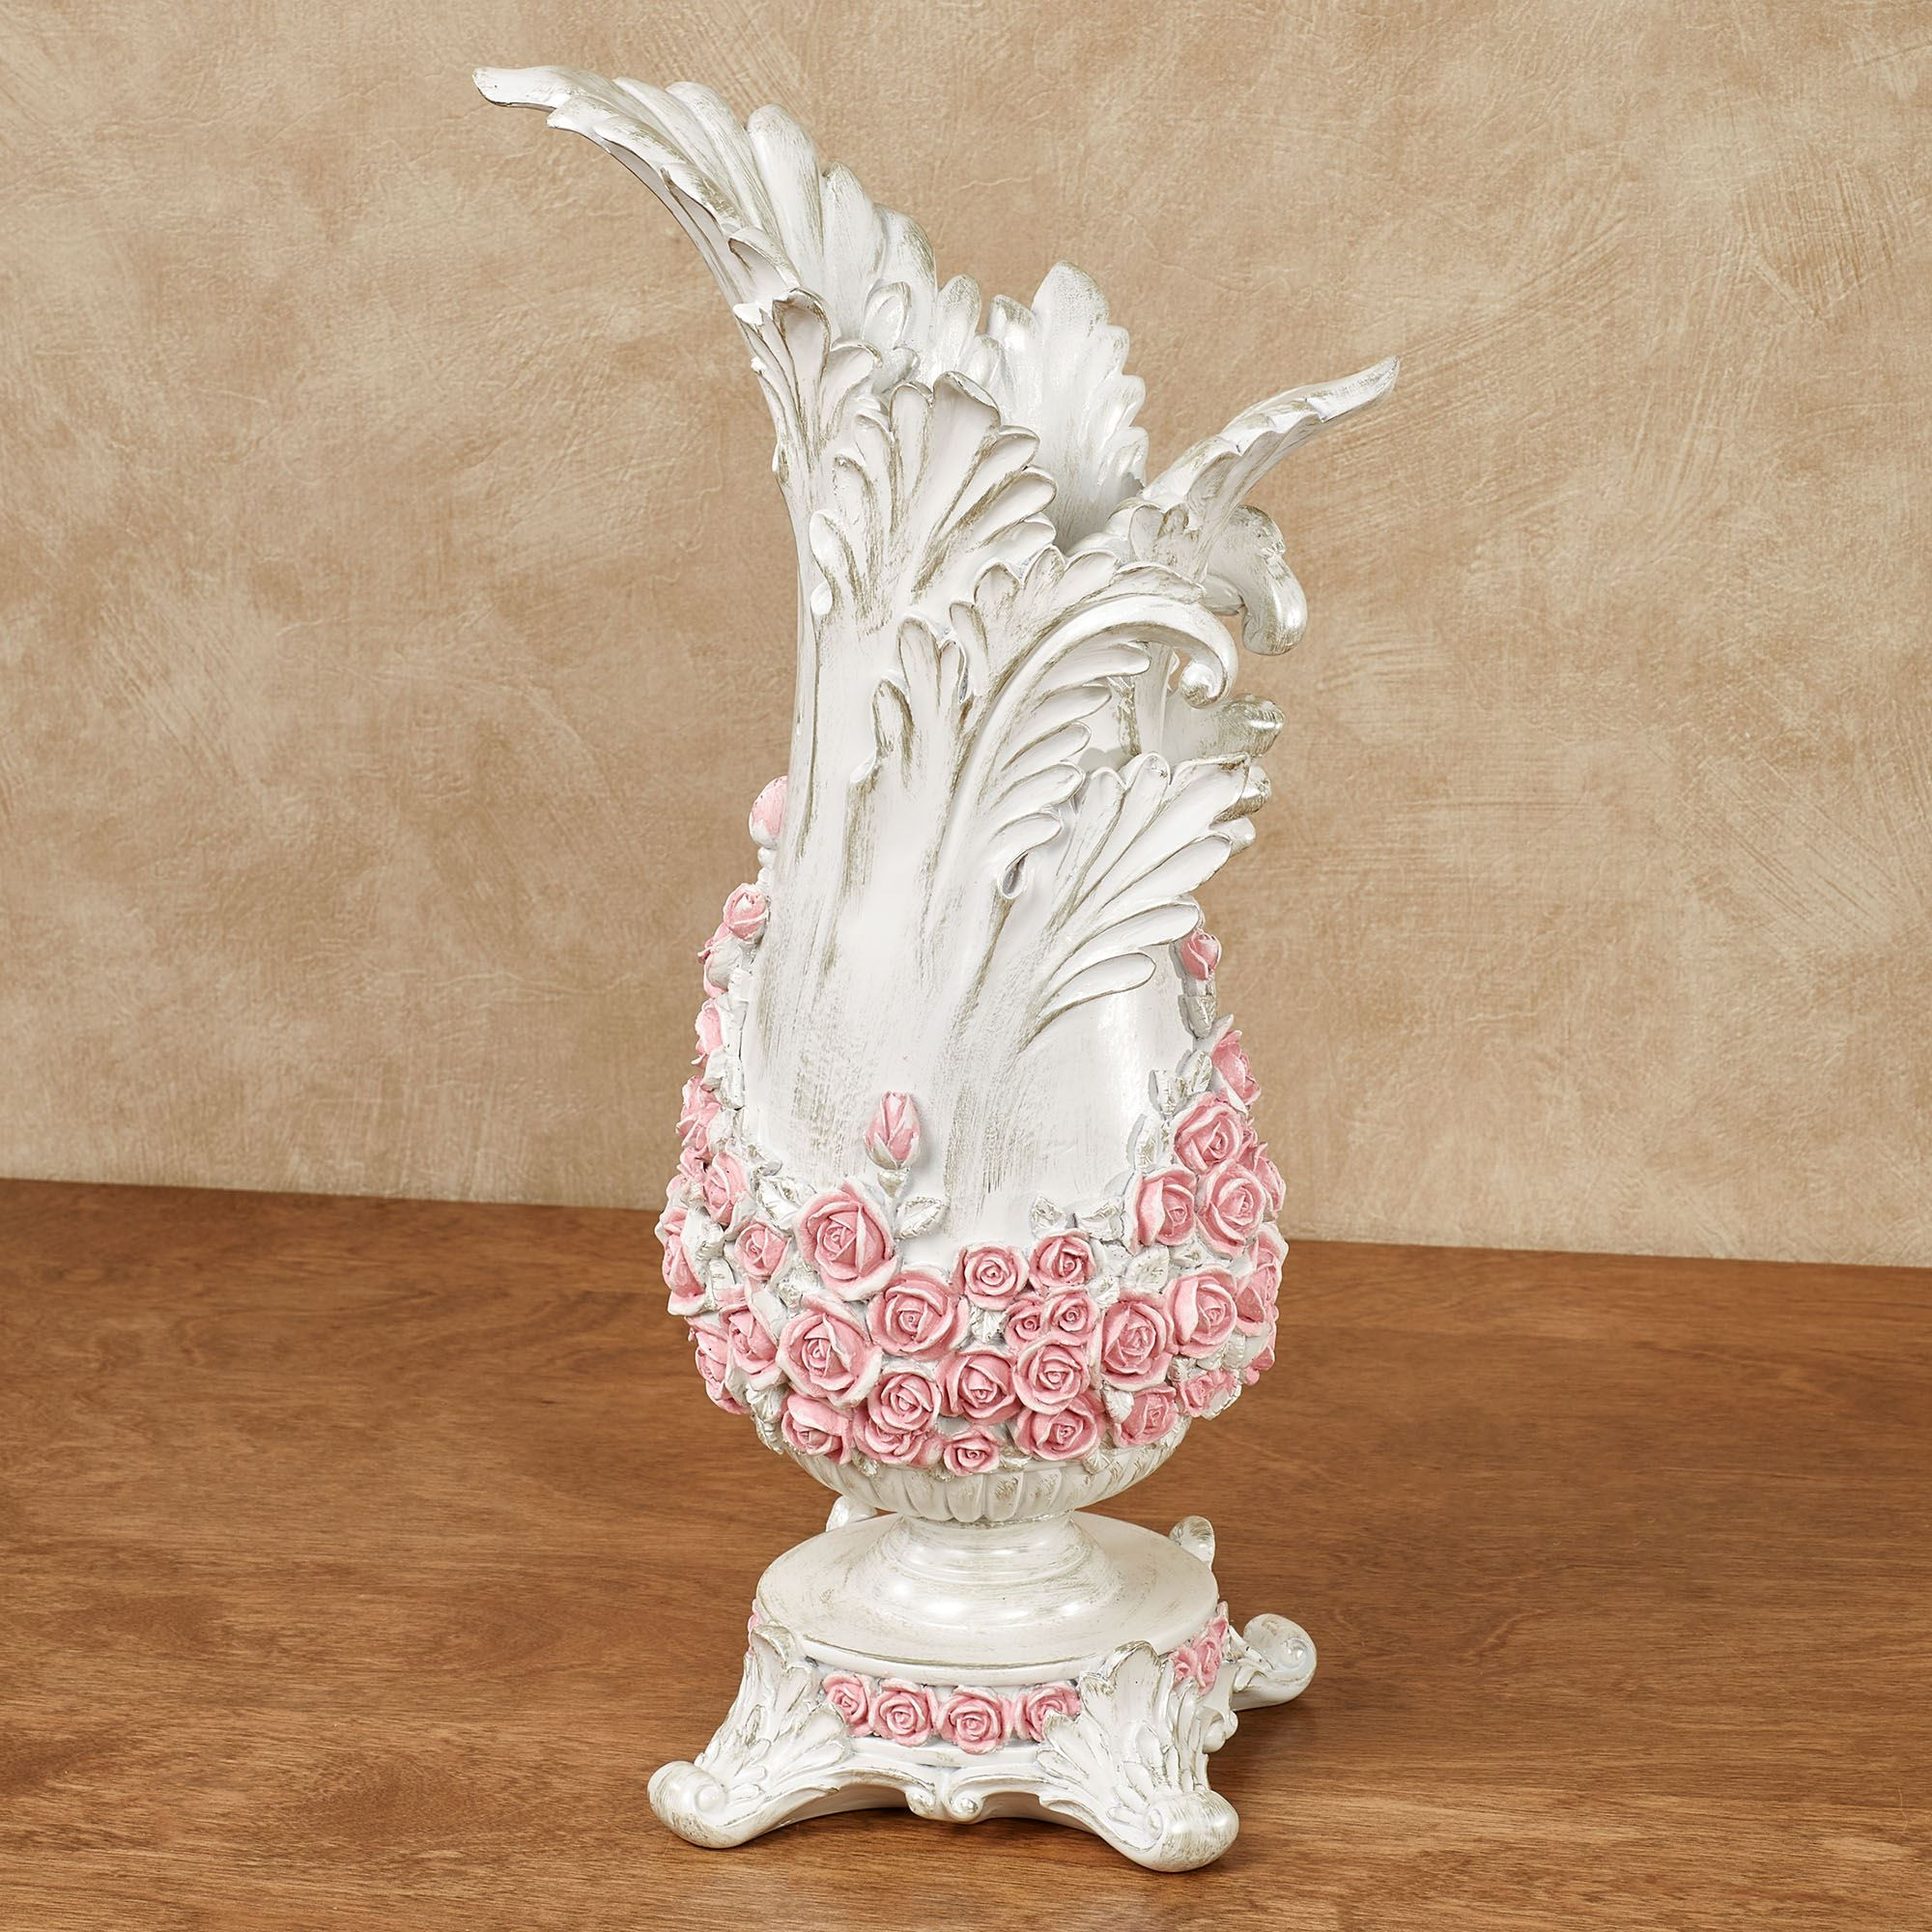 Victorian Rose Antique White Decorative Table Vase